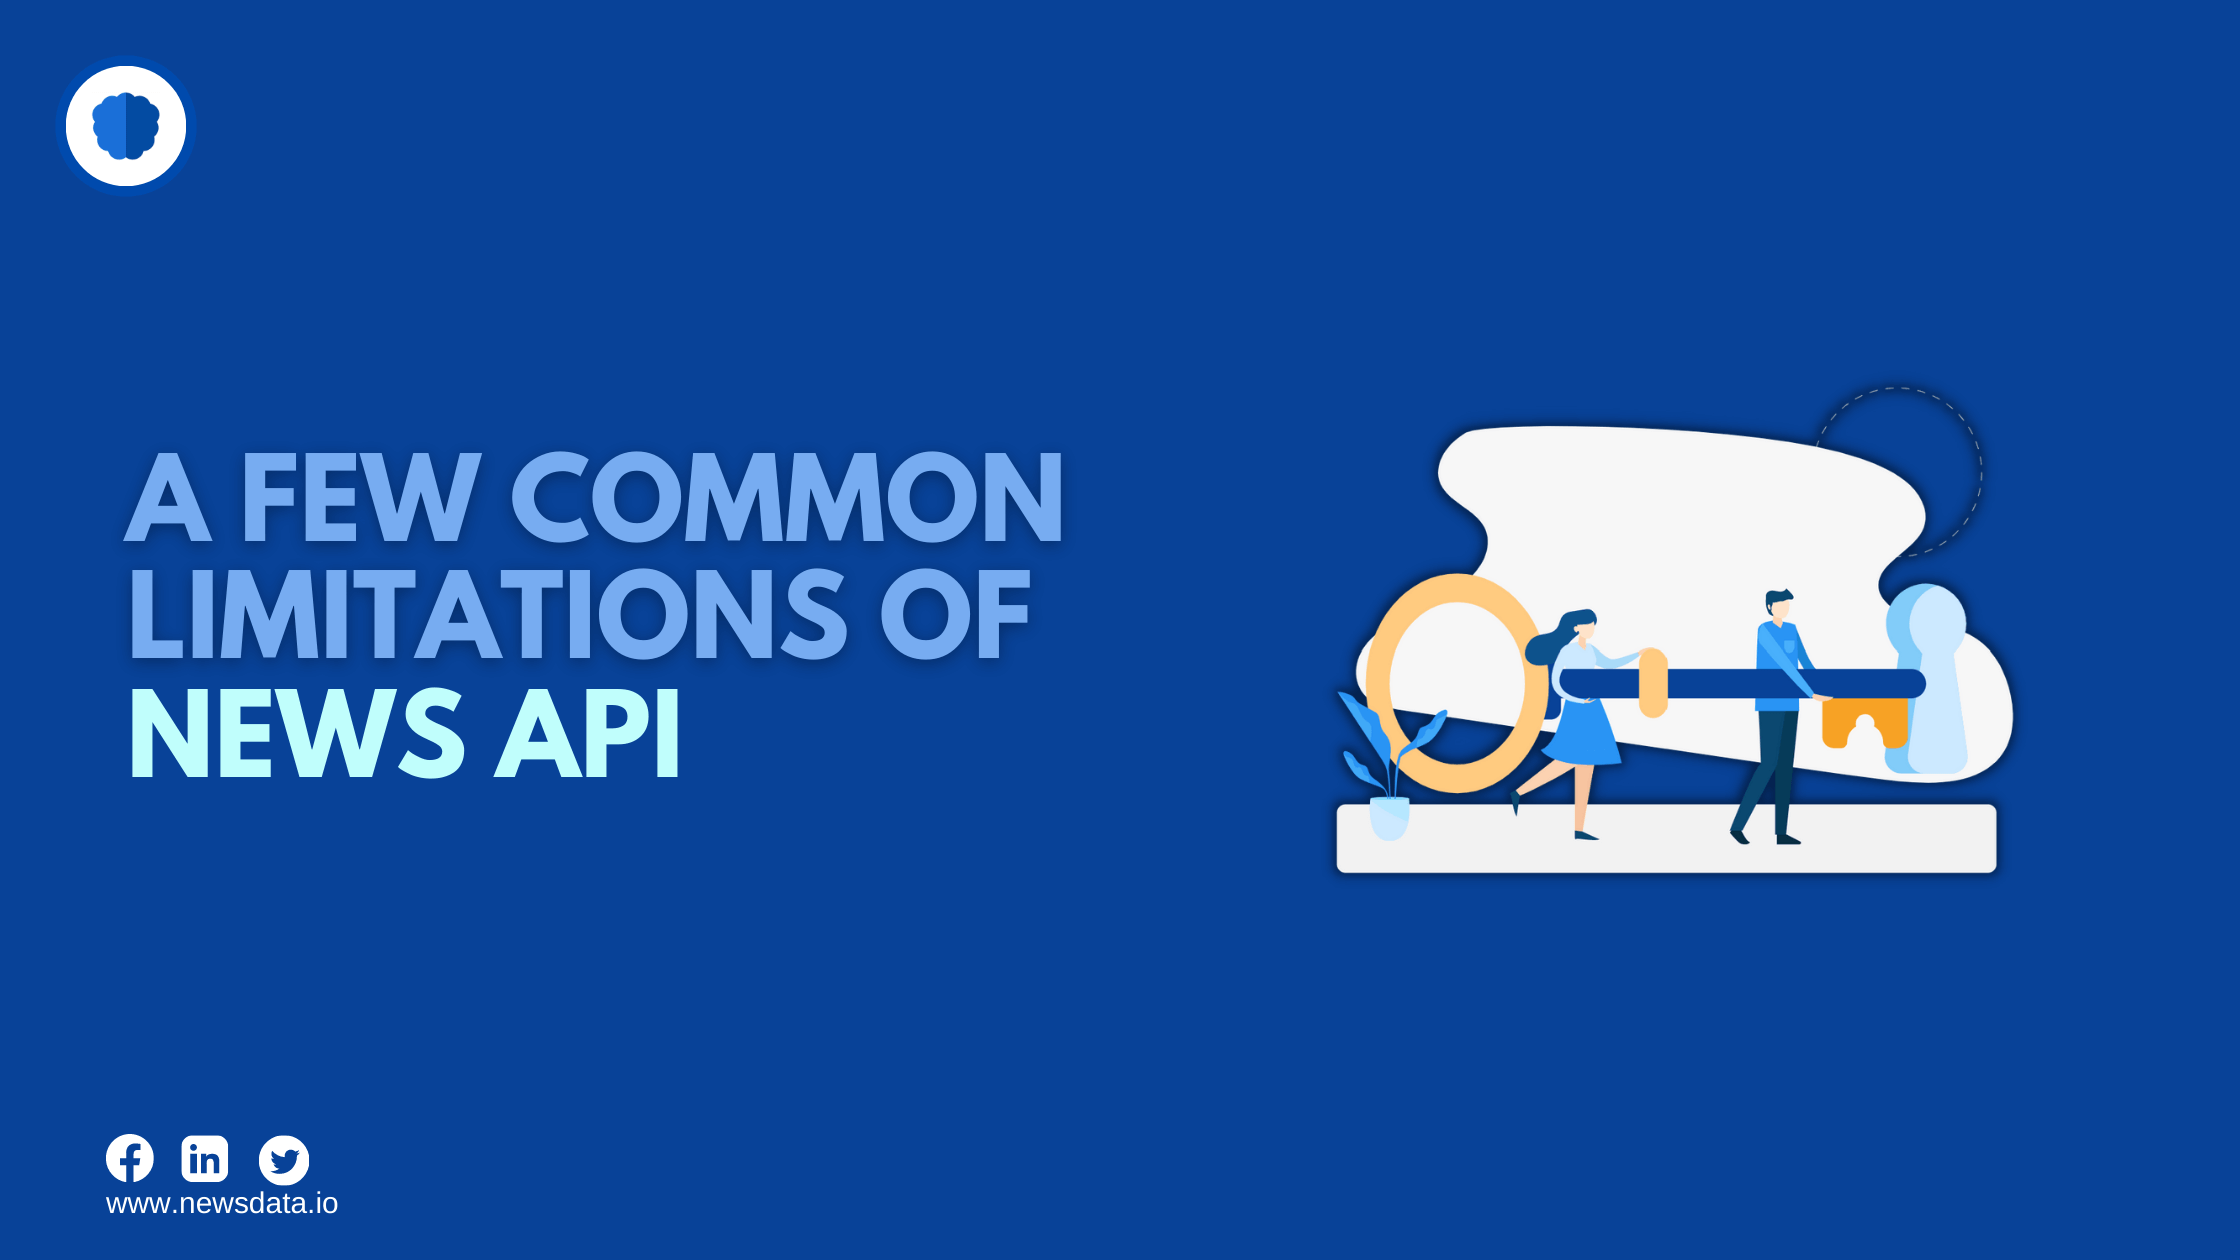 A Few Common Limitations of News API